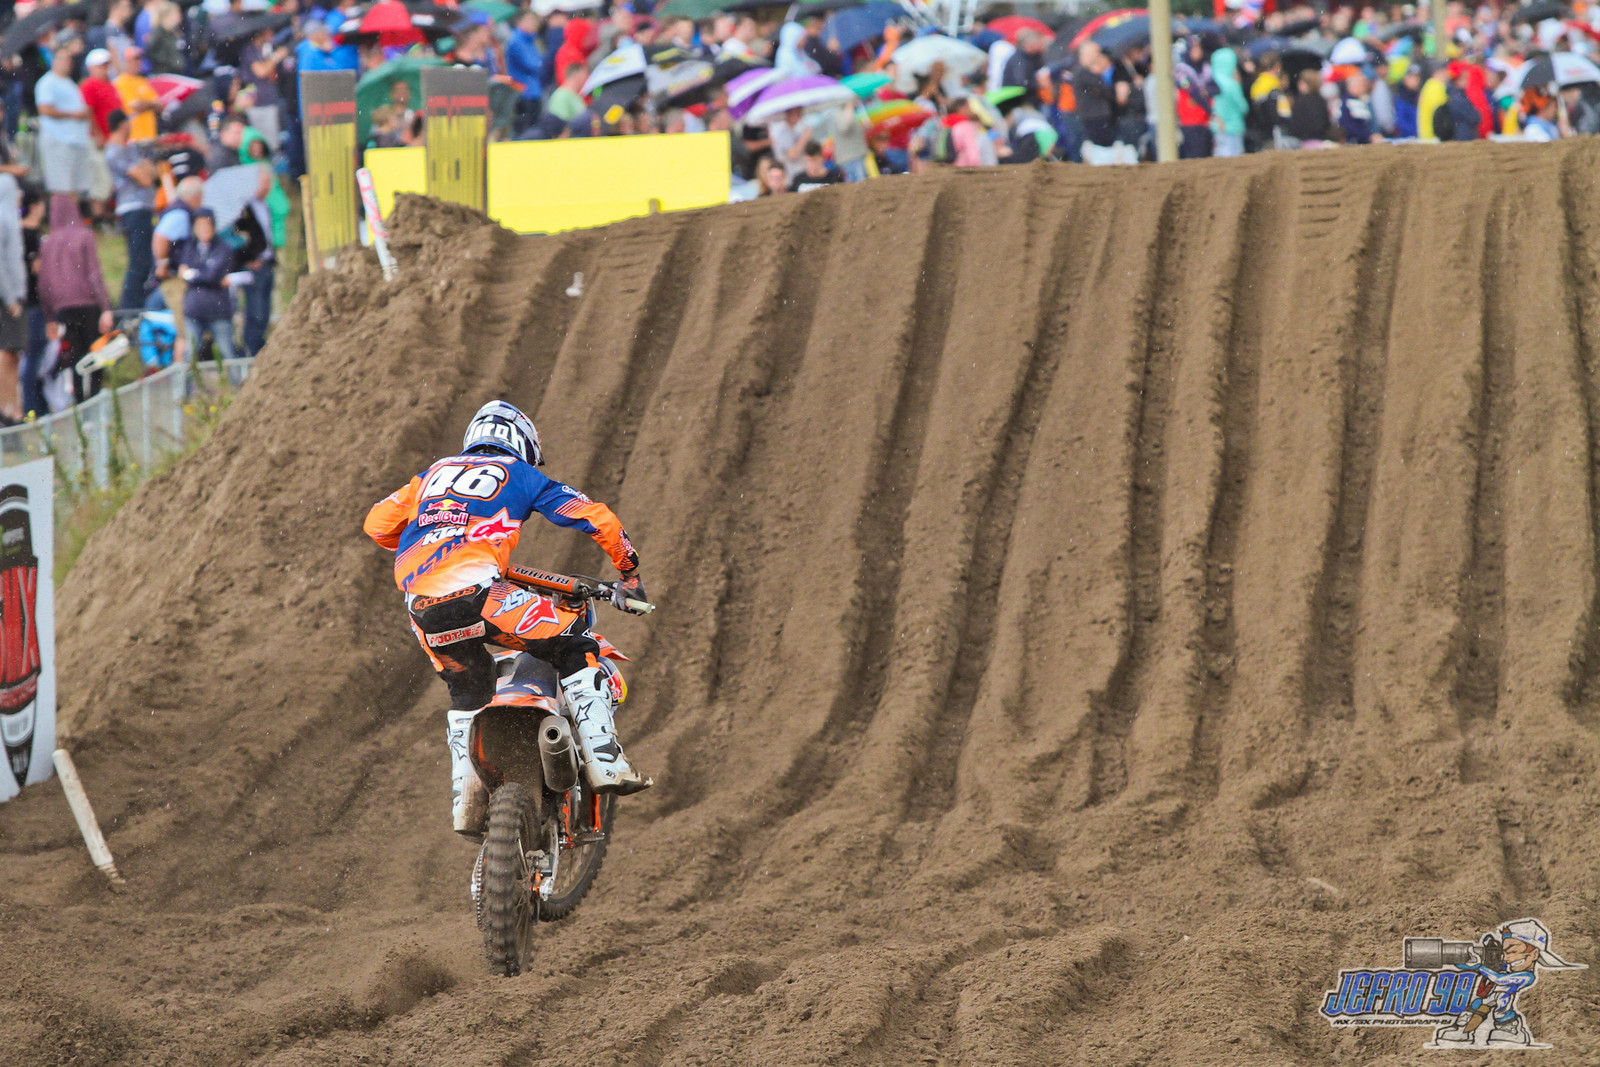 Davy Pootjes - Photo Gallery: MXGP of Limburg - Motocross Pictures - Vital MX